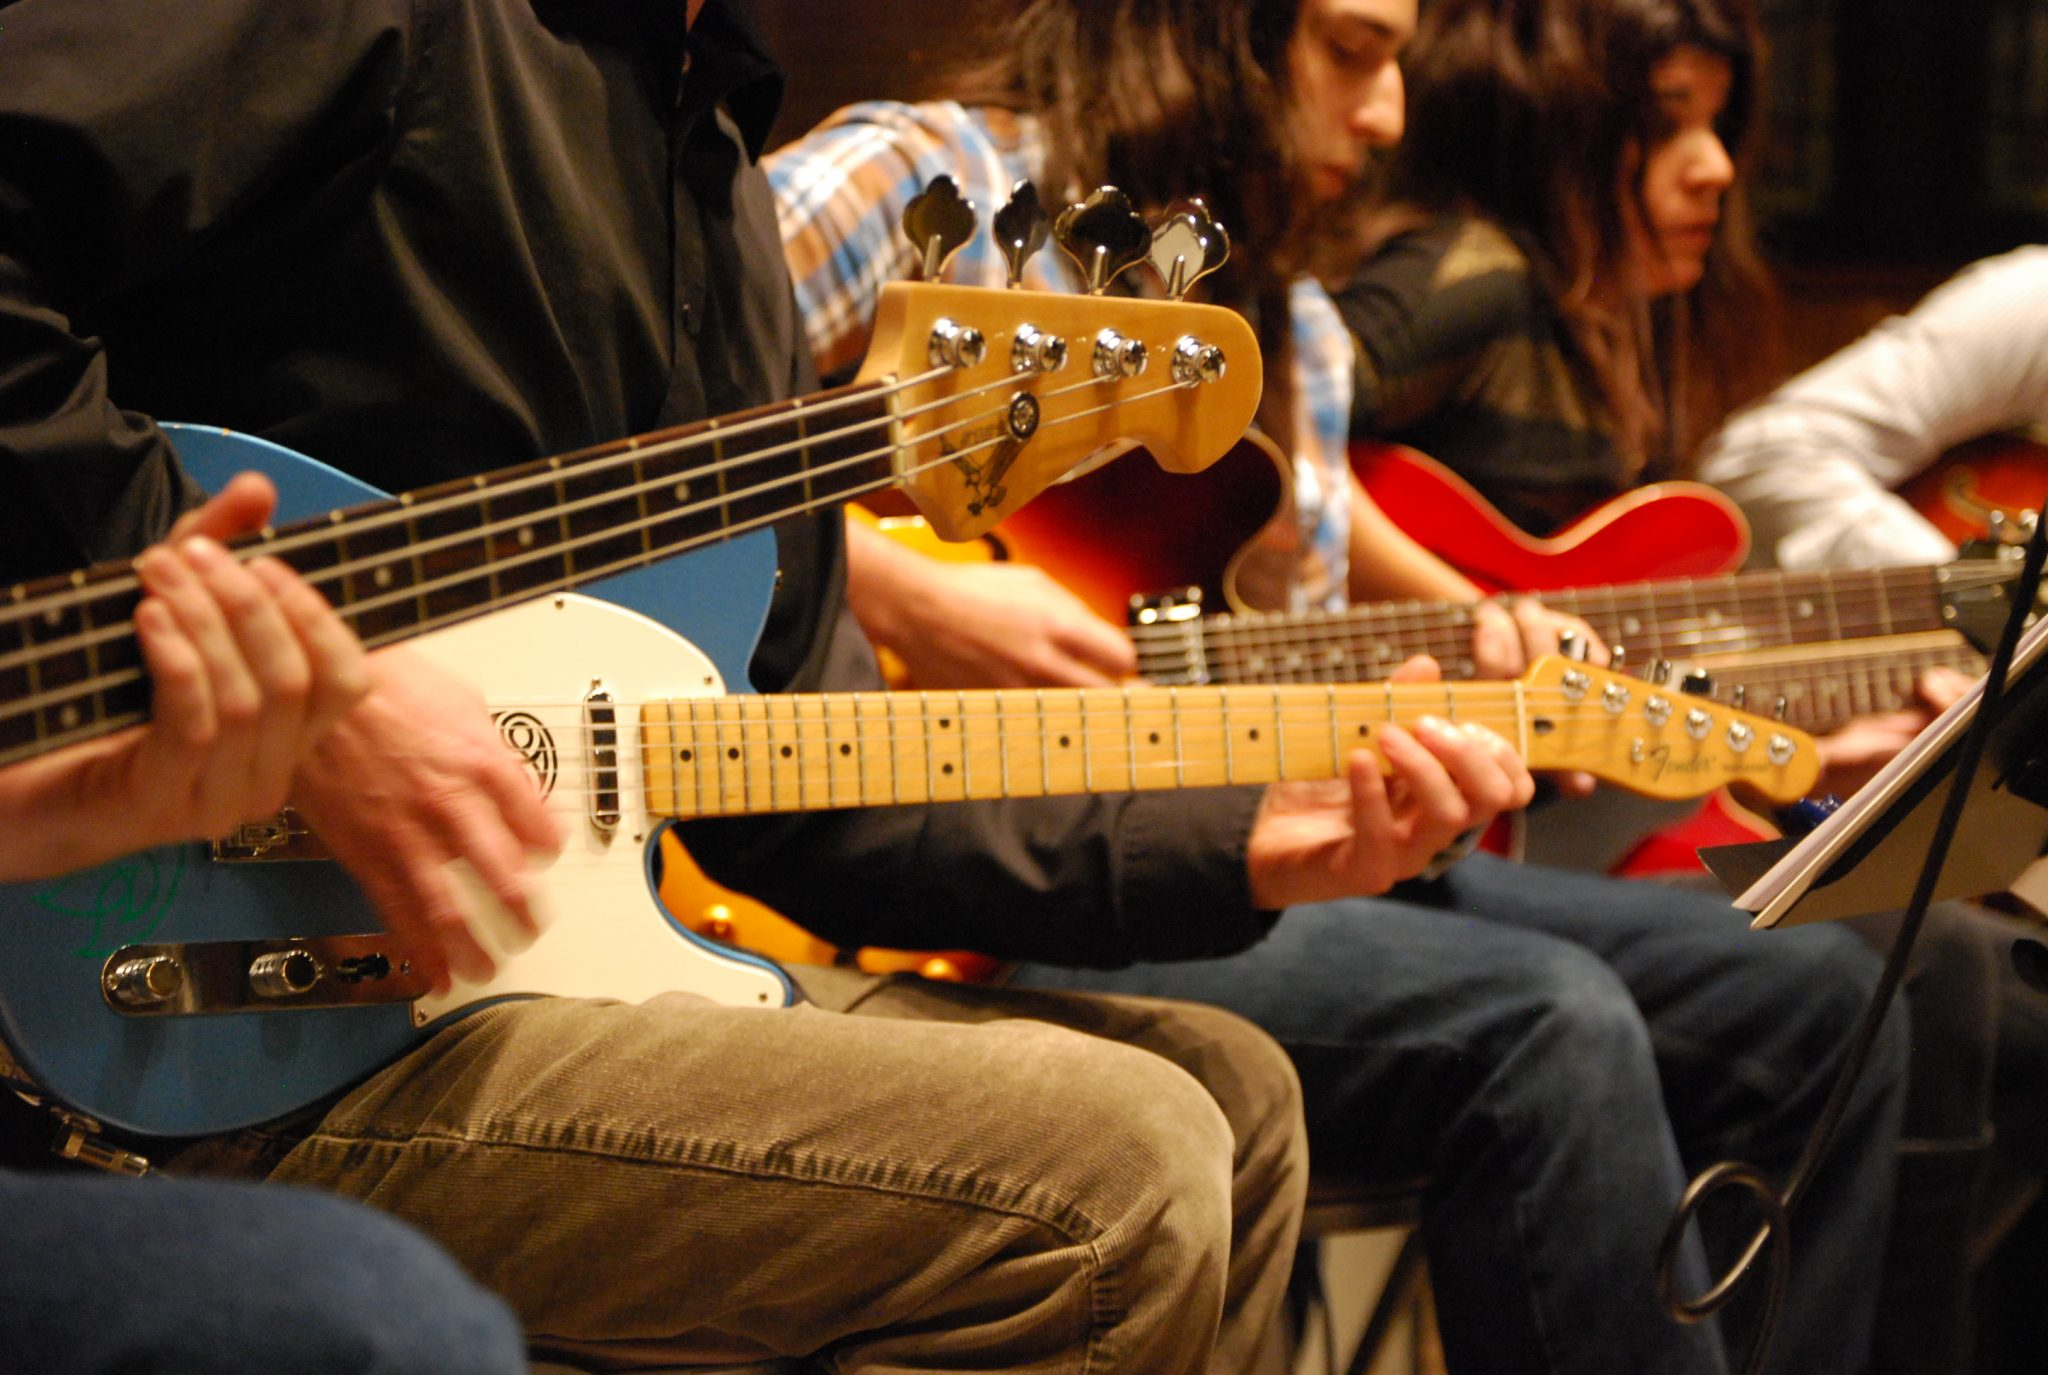 Montavilla Guitar Studio ensembles performing at TaborSpace